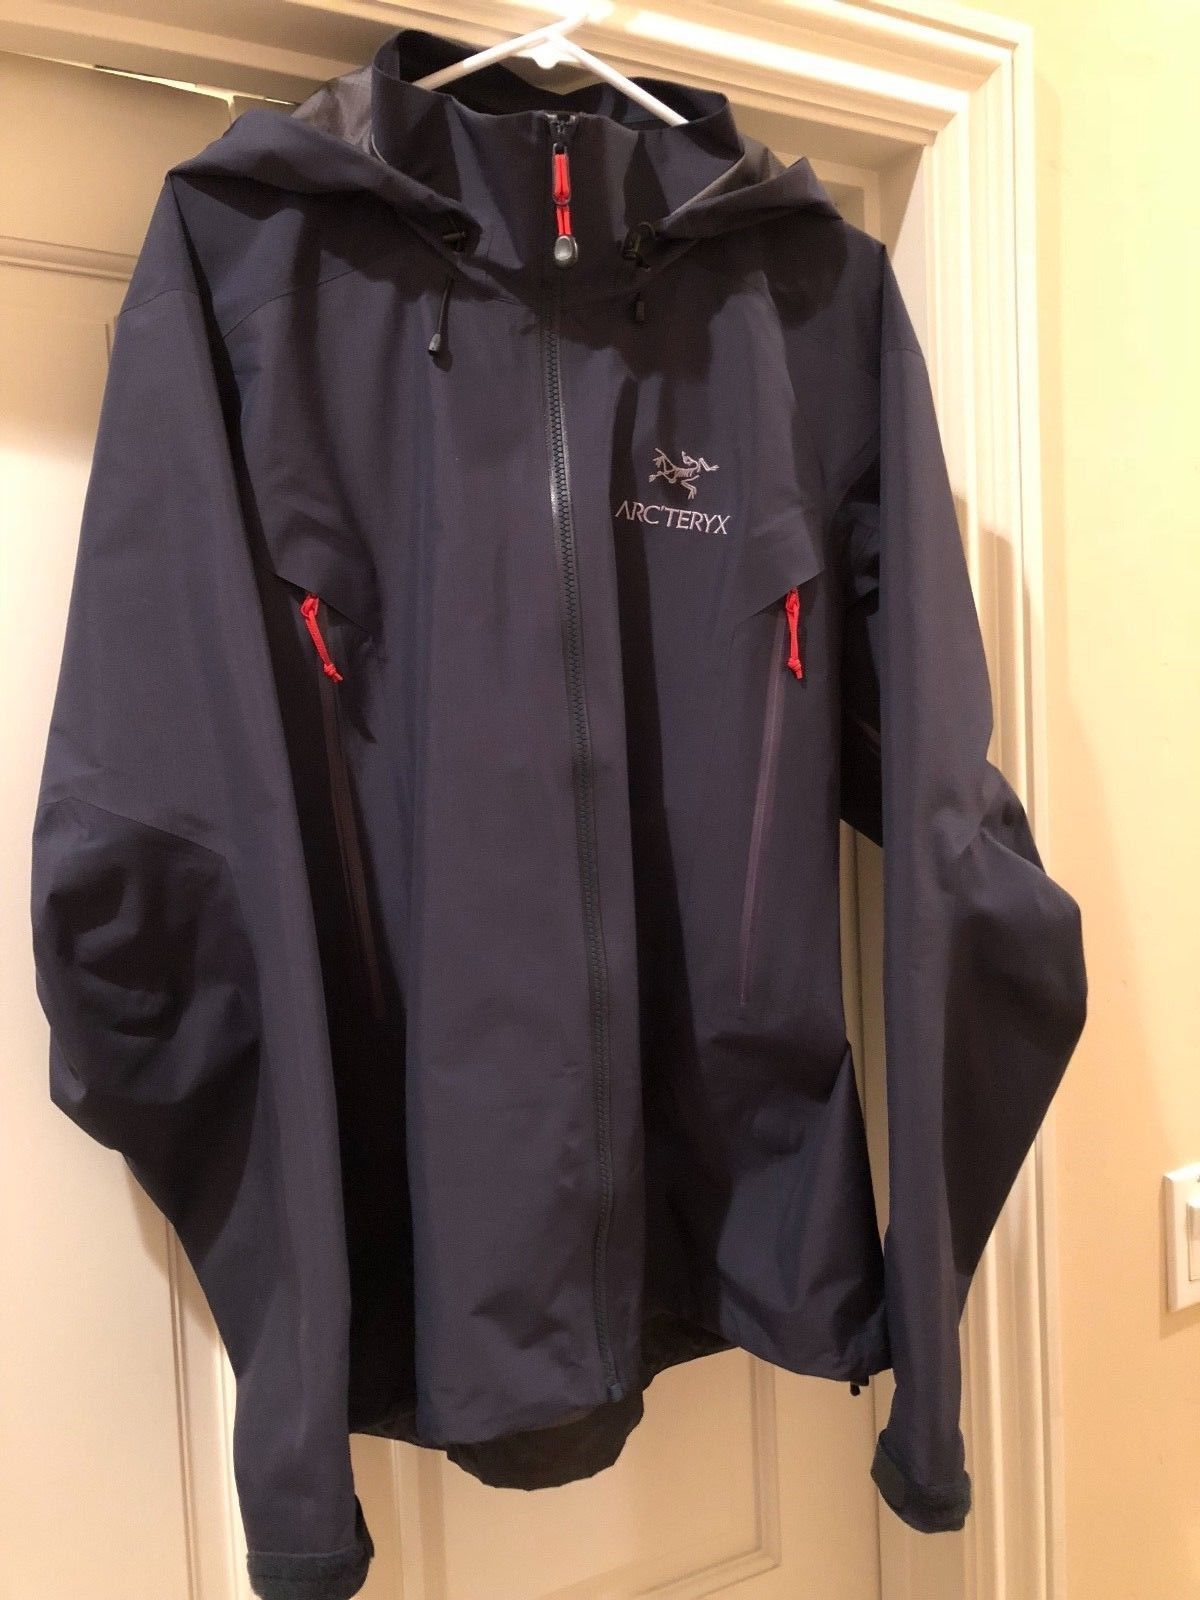 fdbe41c1 Arc'teryx Beta AR Nighthawk - Size Large | Men's Clothing | Jackets ...